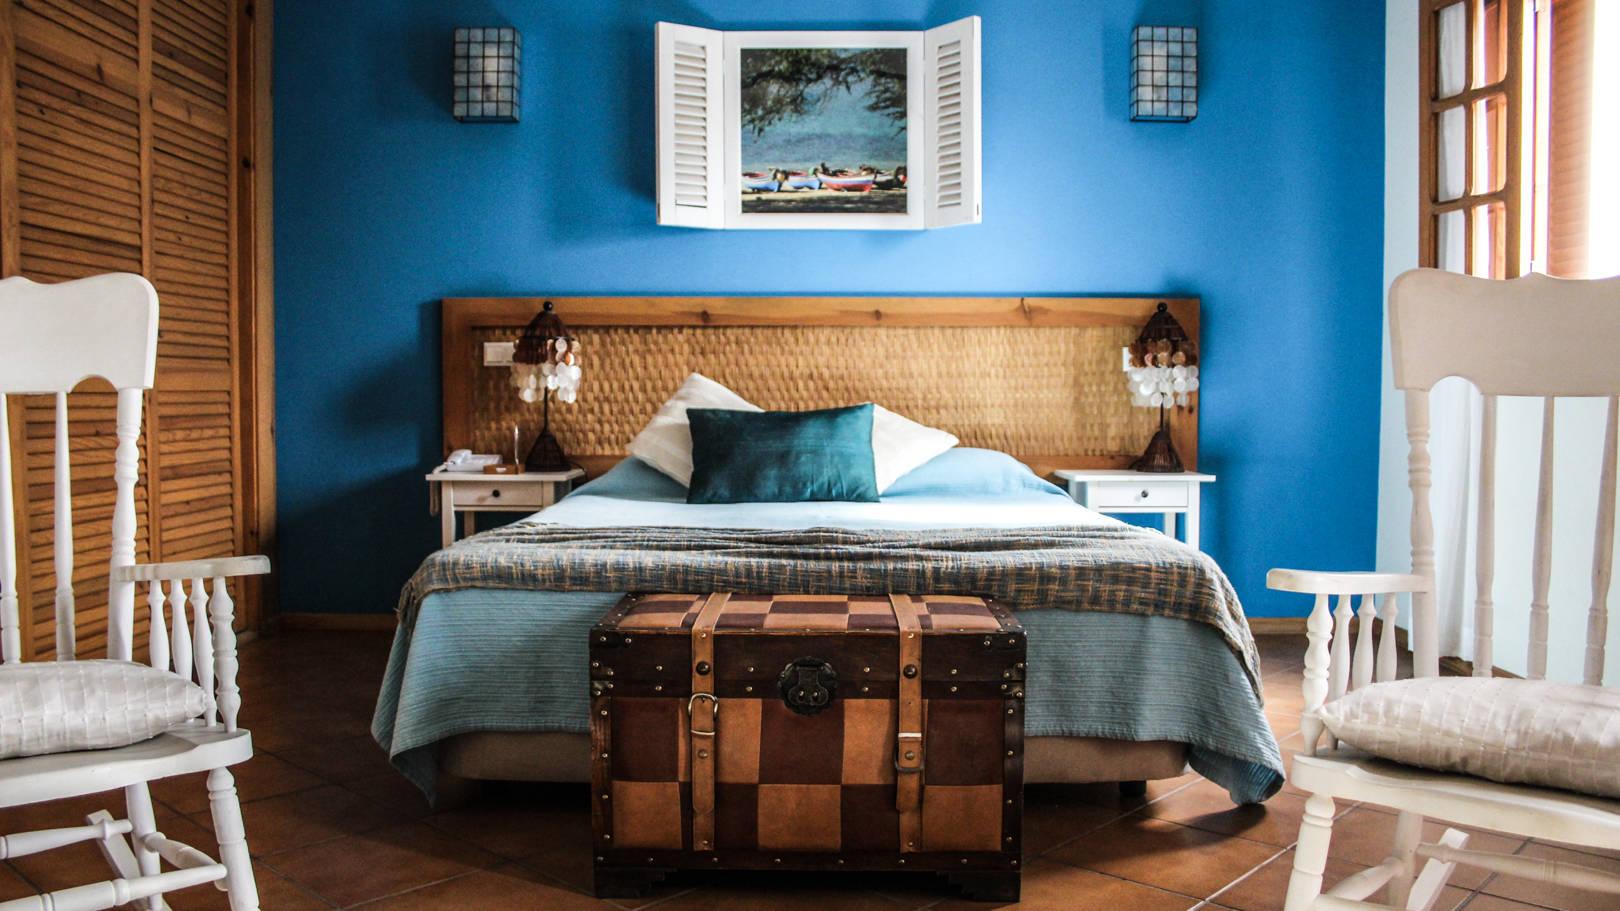 Accommodaties in Kaapverdië - Boetiekhotel